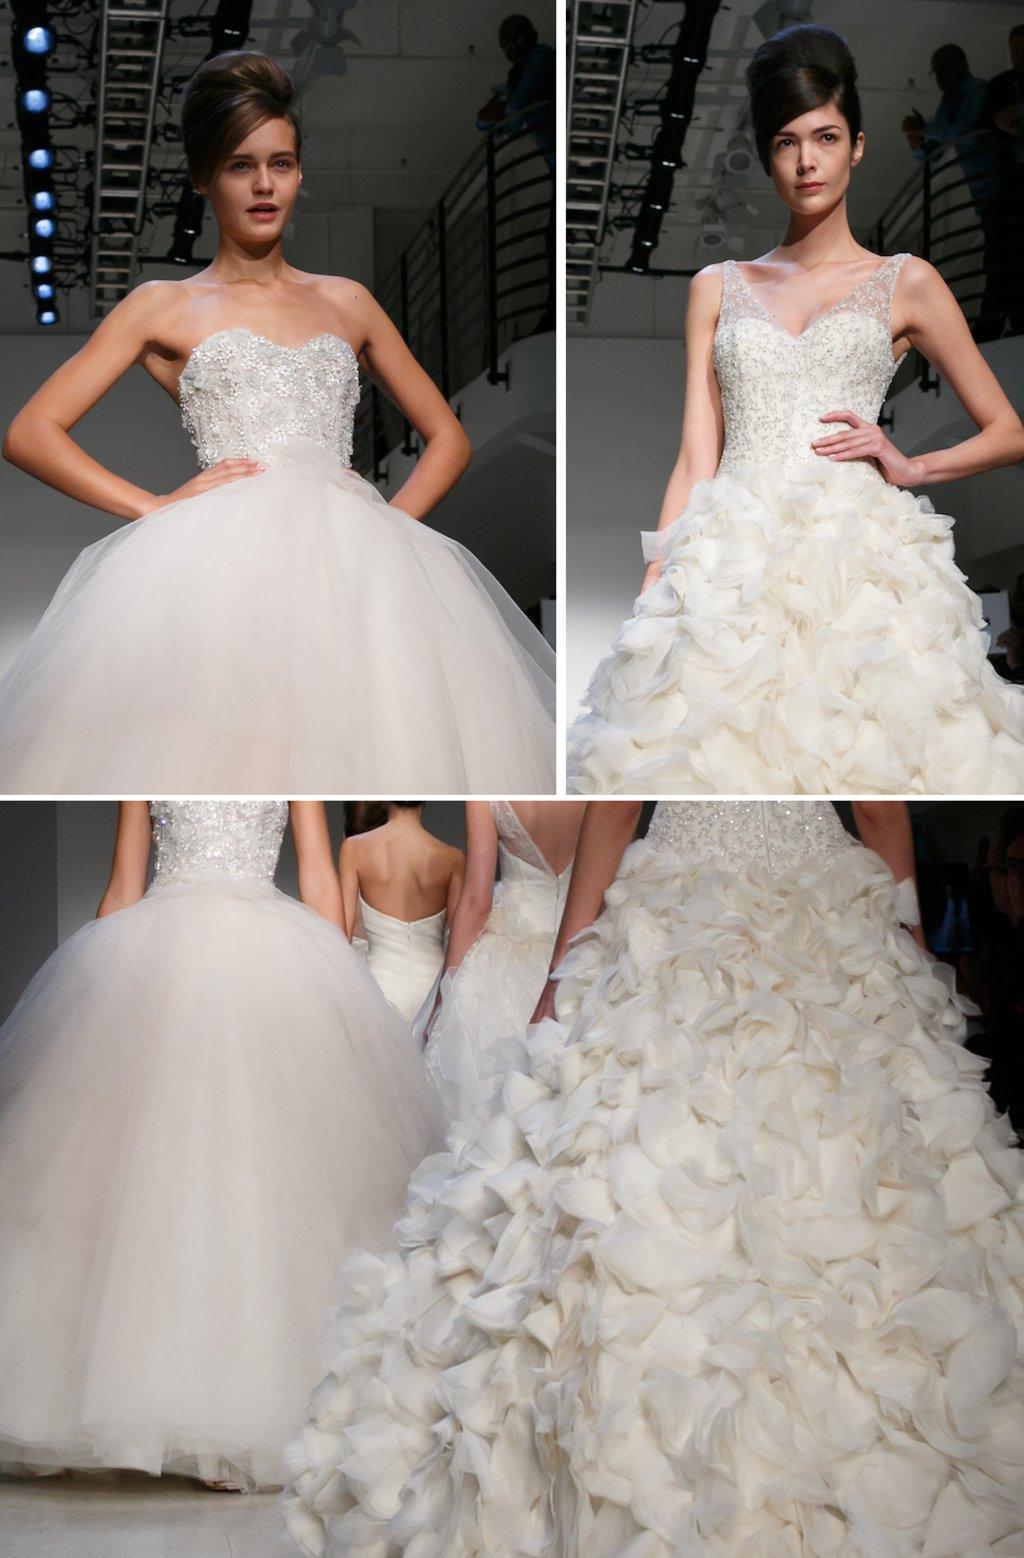 Fall-2013-wedding-dresses-by-kenneth-pool-glamorous-bridal-gowns-2.full